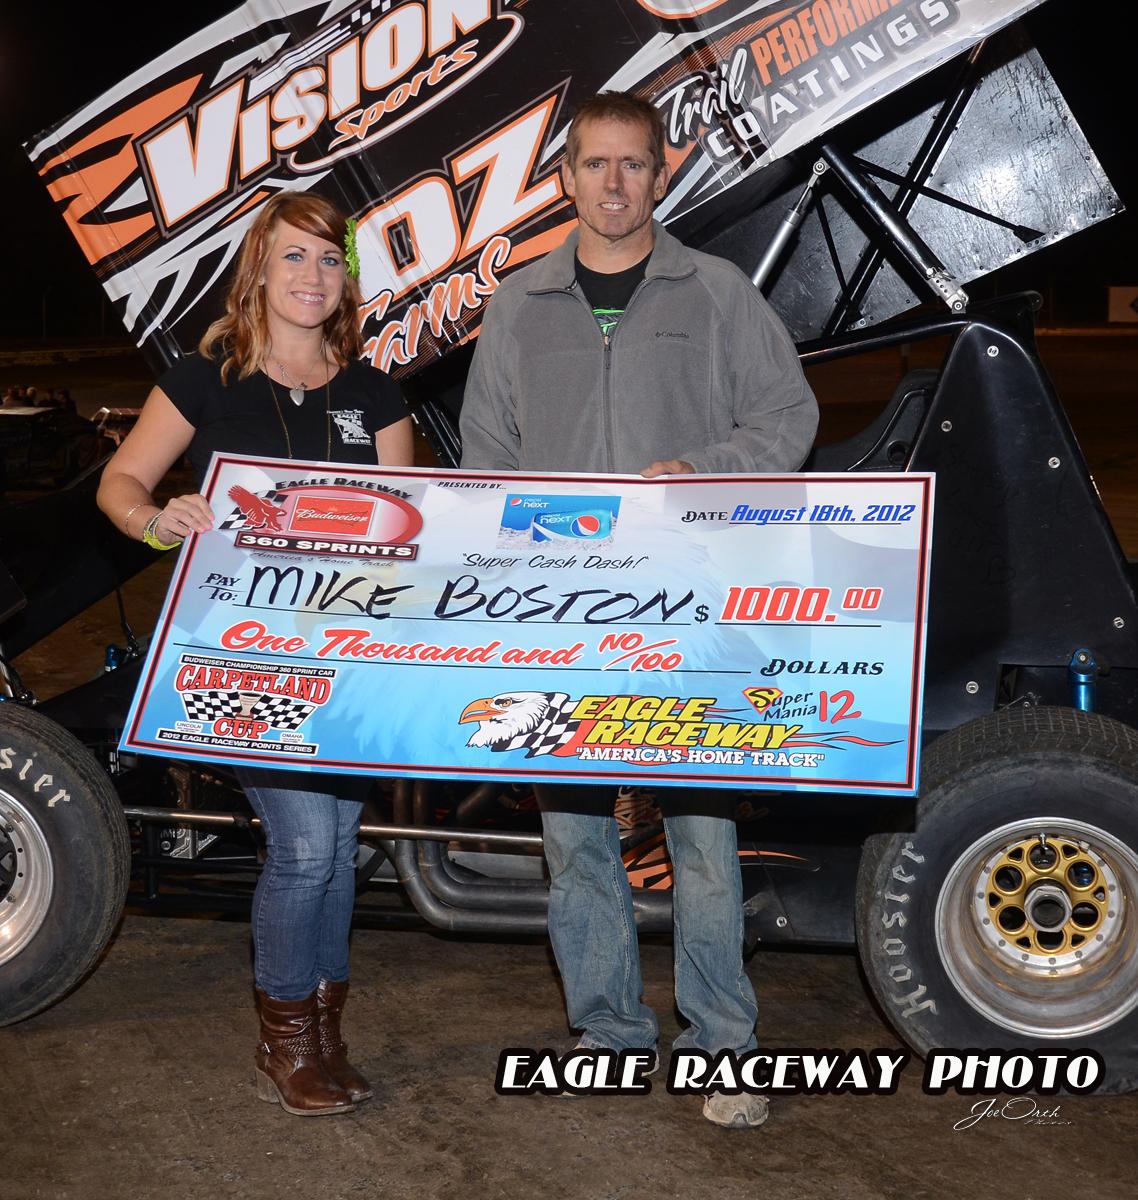 eagle-08-18-12-543-mike-boston-with-elle-patocka